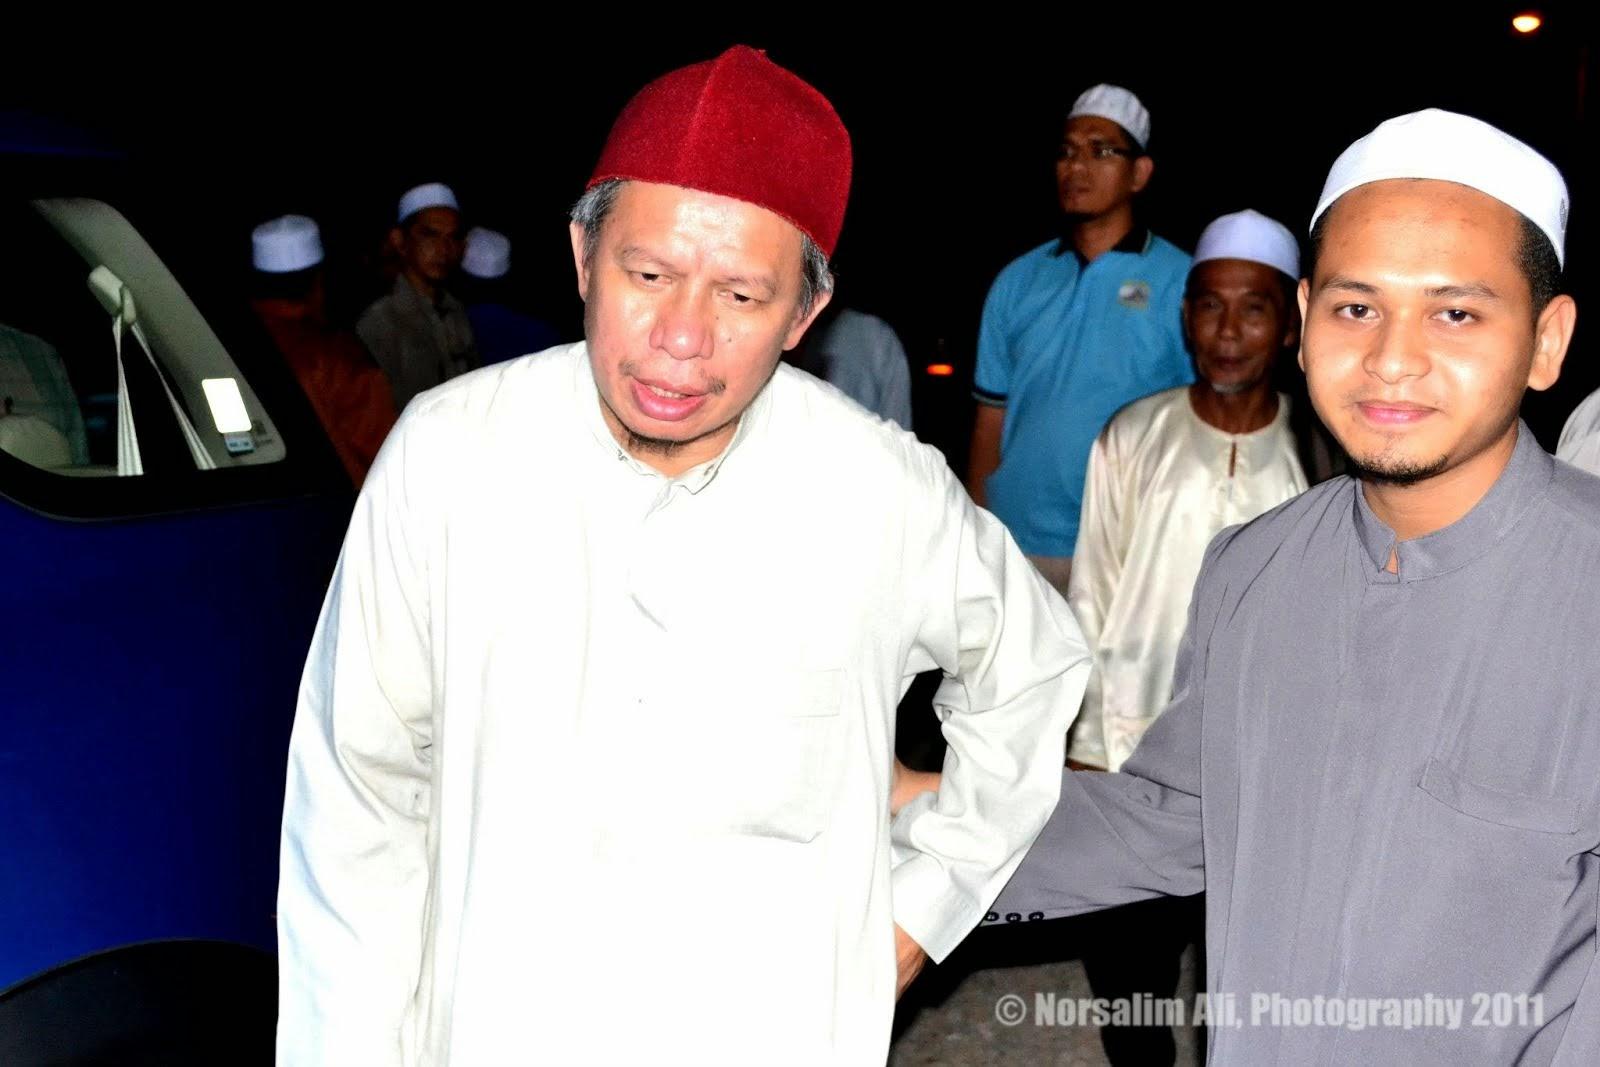 PENGERUSI PERTAMA LEMBAGA PENASIHAT PERTUBUHAN KEBAJIKAN DAN DAKWAH IBNU MAS'UD (2010-2015)